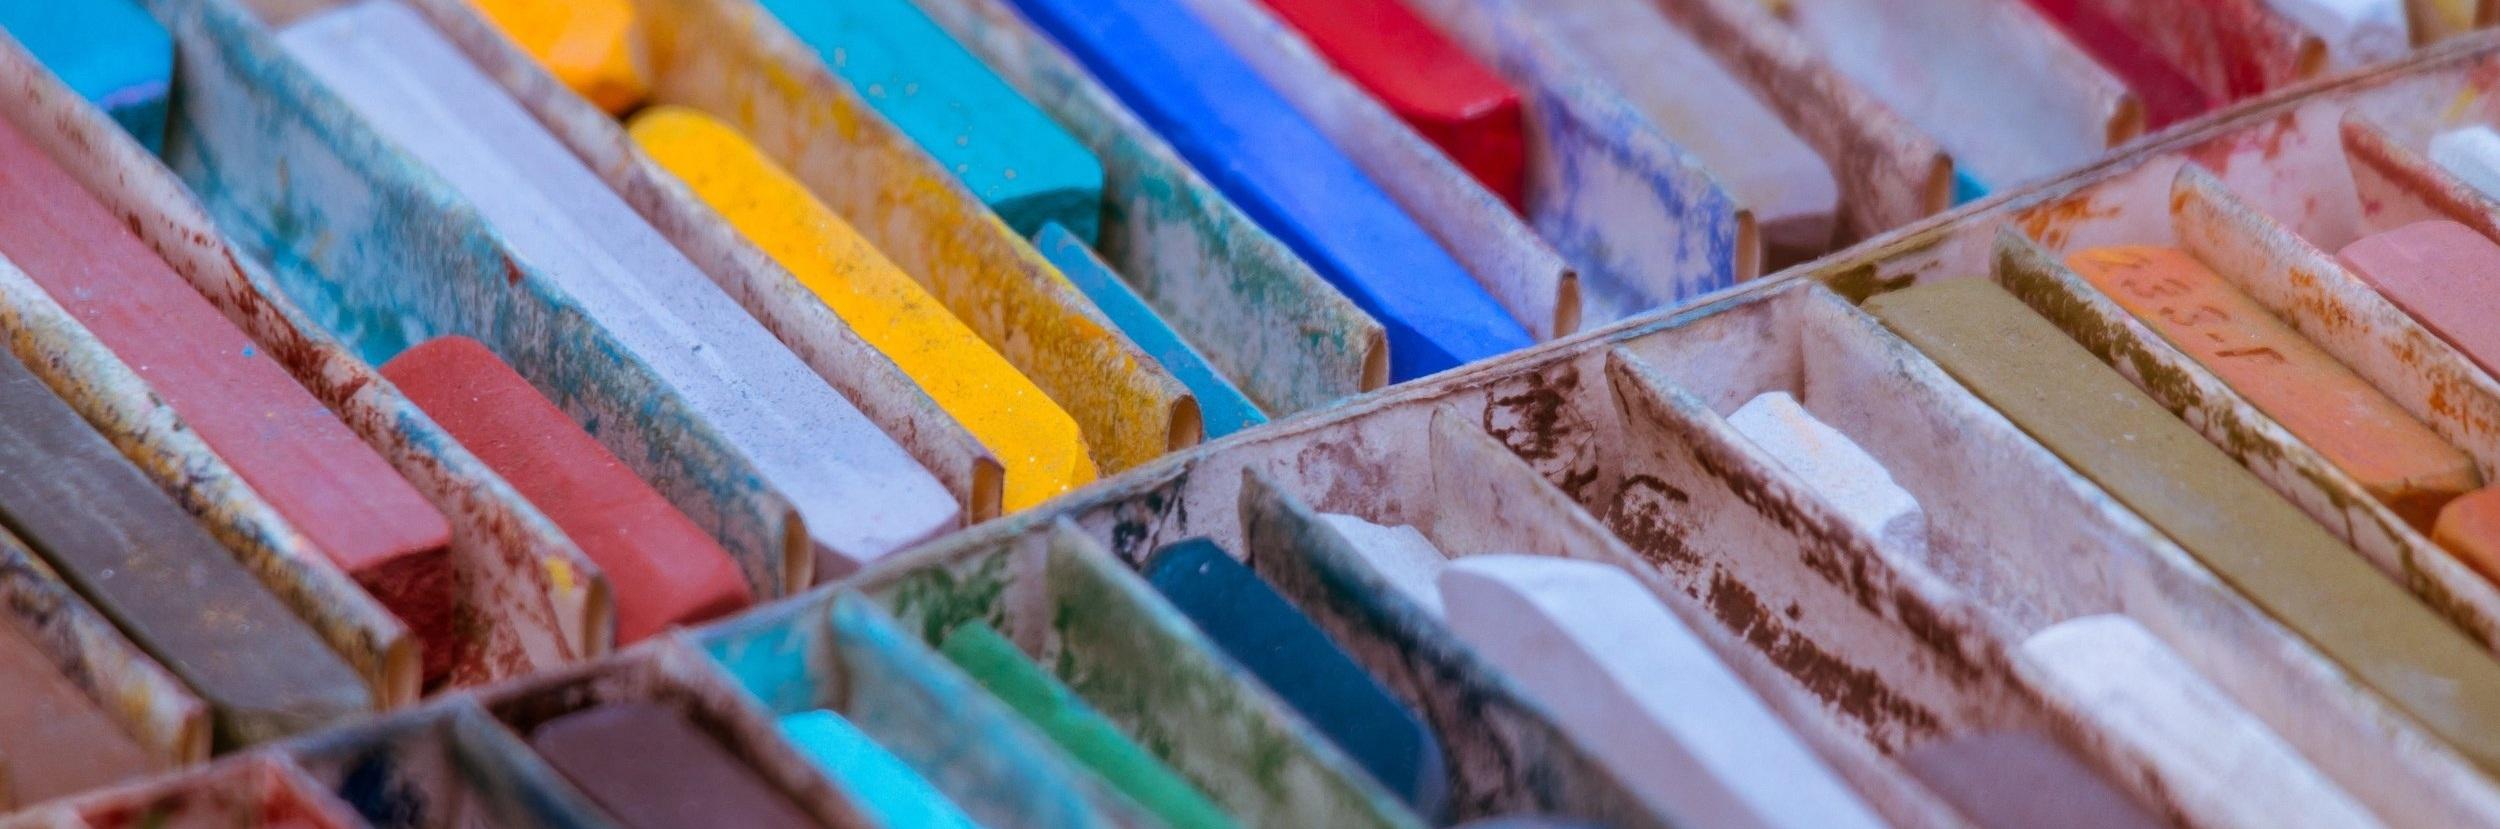 art-materials-close-up-colorful-1629817.jpg